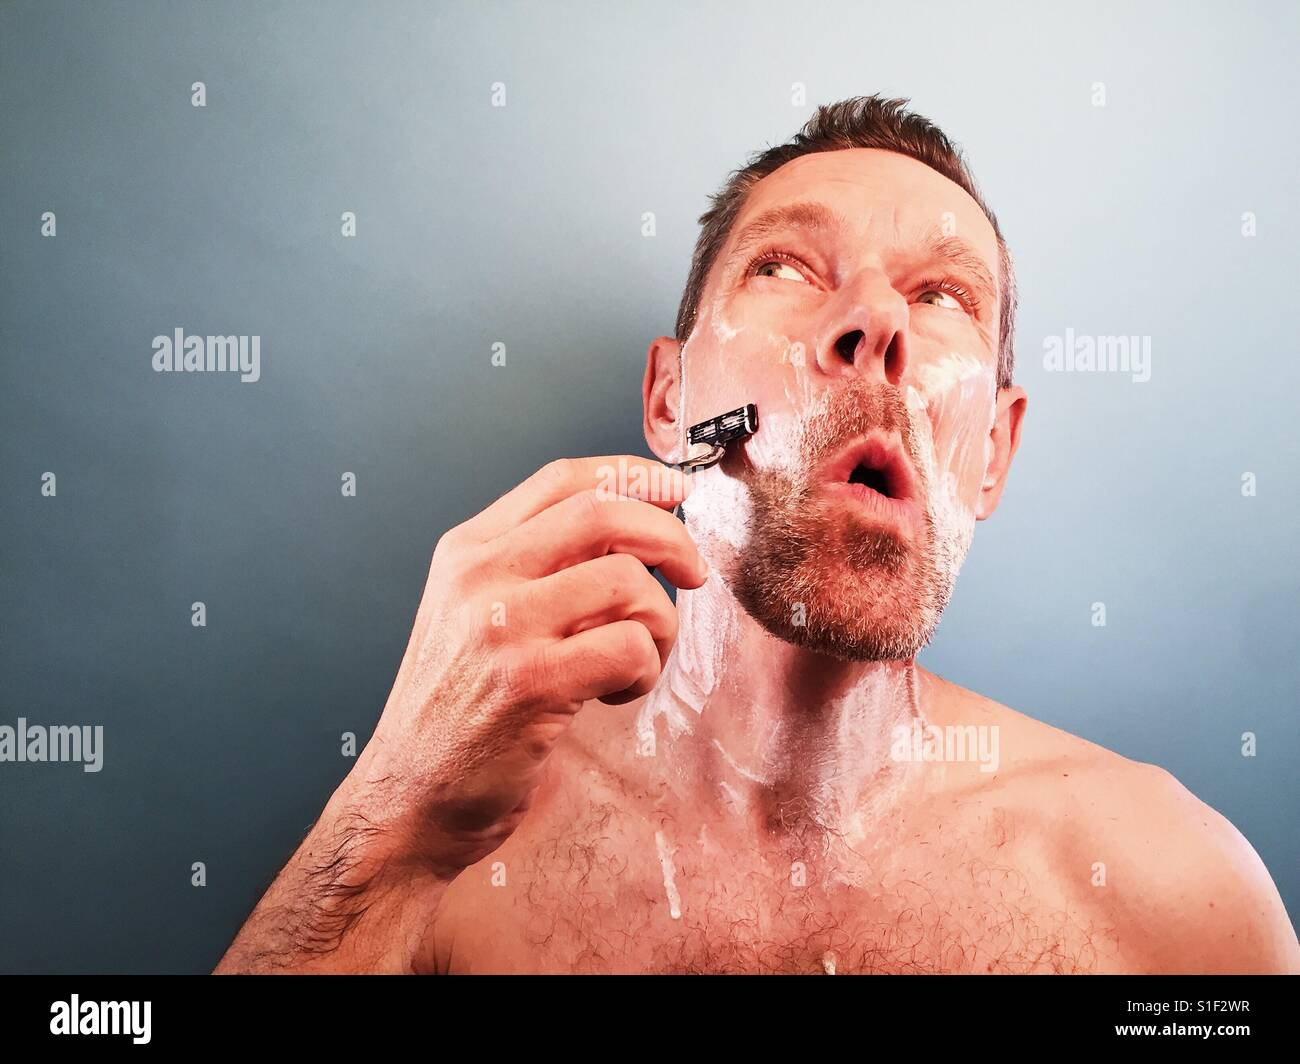 A man shaving - Stock Image